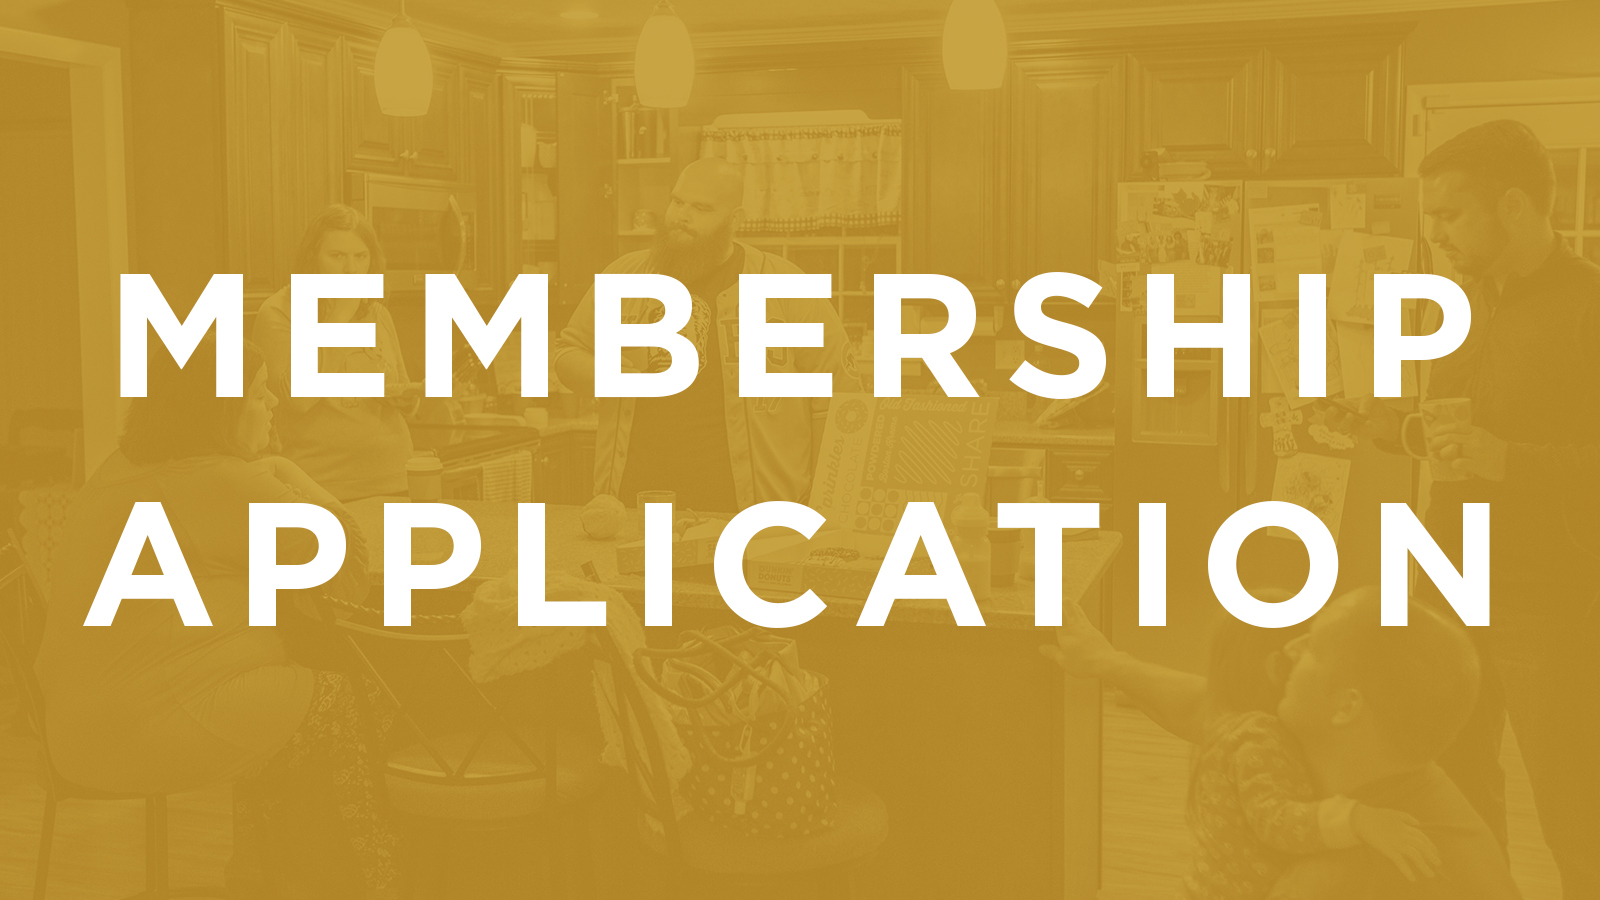 MembershipApplication.jpg